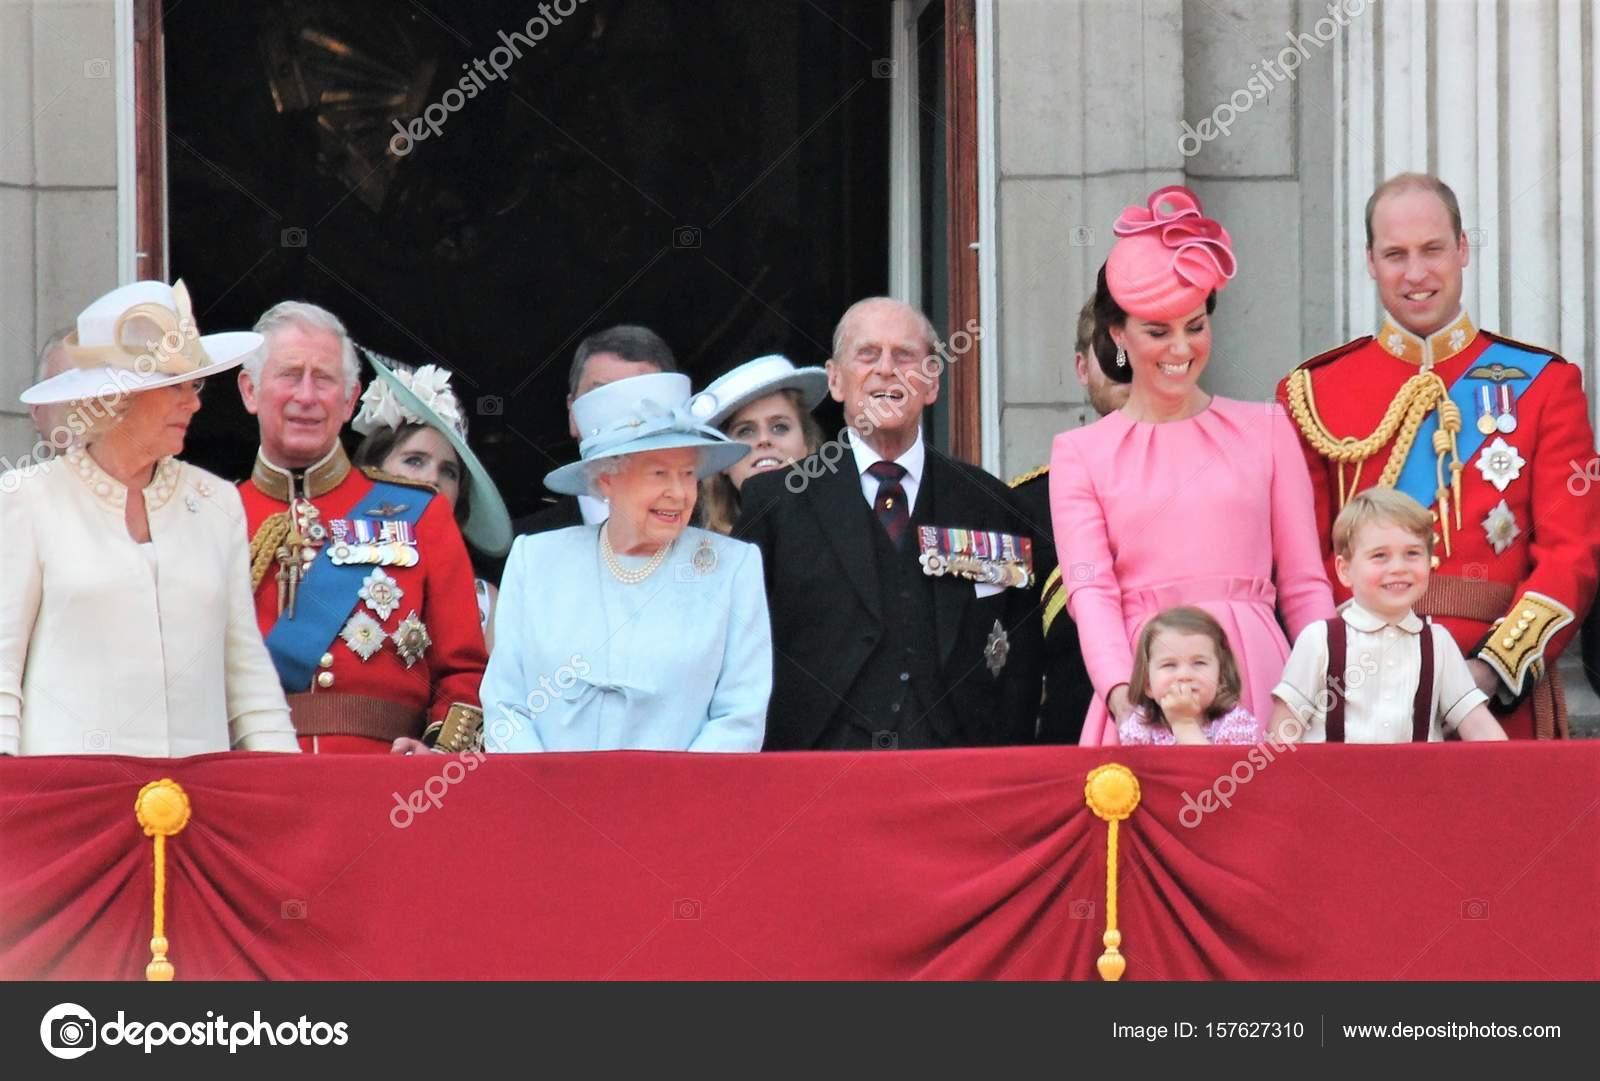 Queen Elizabeth Konigsfamilie Buckingham Palace London Juni 2017